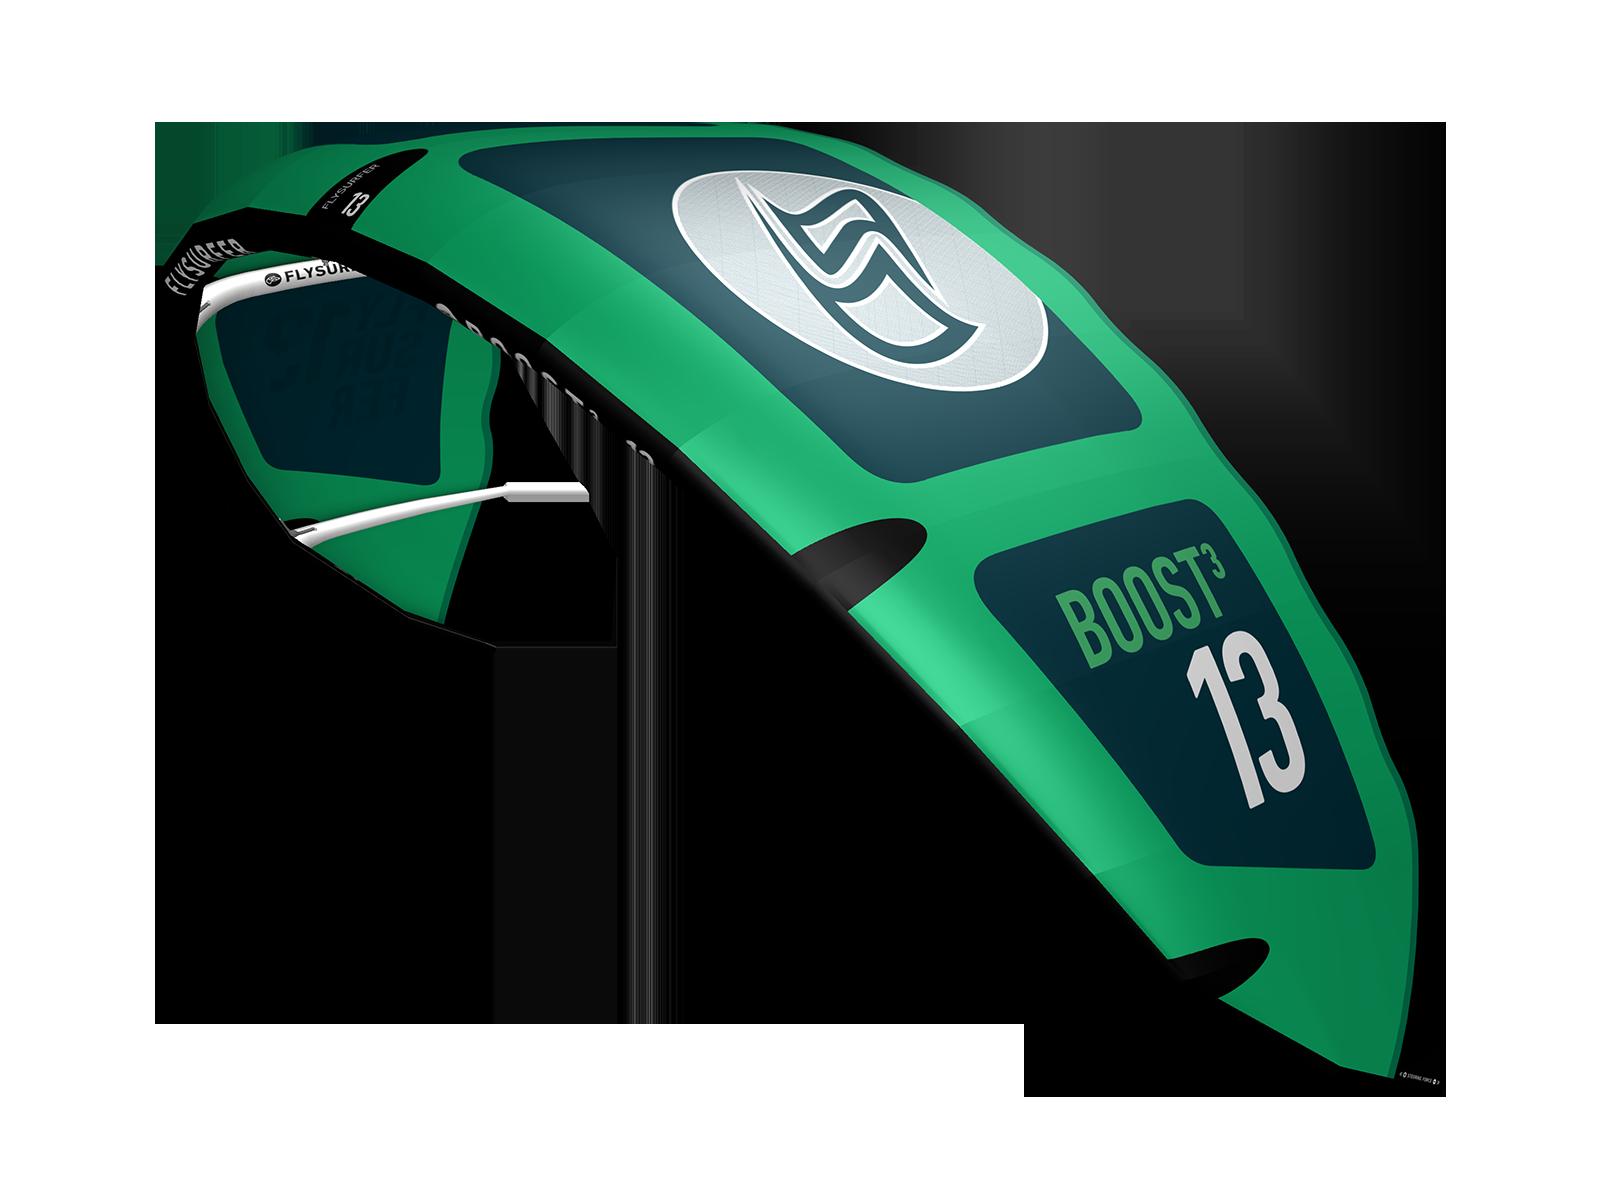 BOOST3-3D-13 Kiteflow